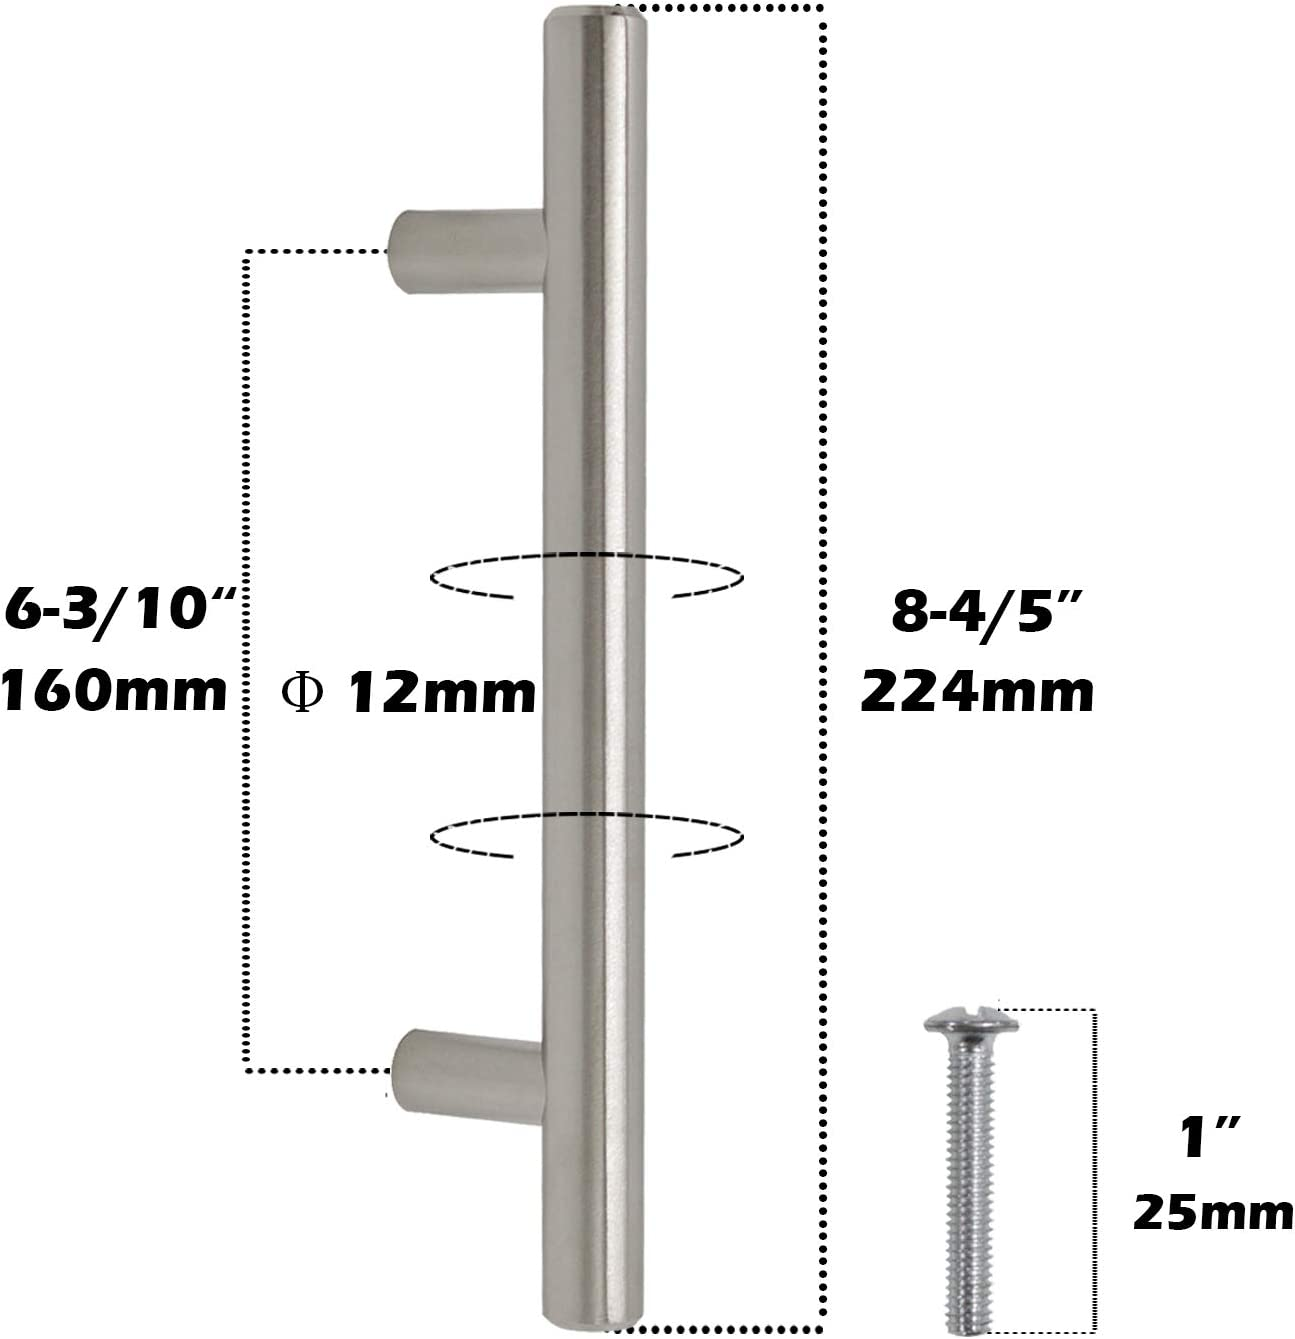 30Pack Gobrico Single T bar 50mm//2in Drawer Pull Handle Knob For Furniture Dresser Cupboard Hardware Satin Nickle